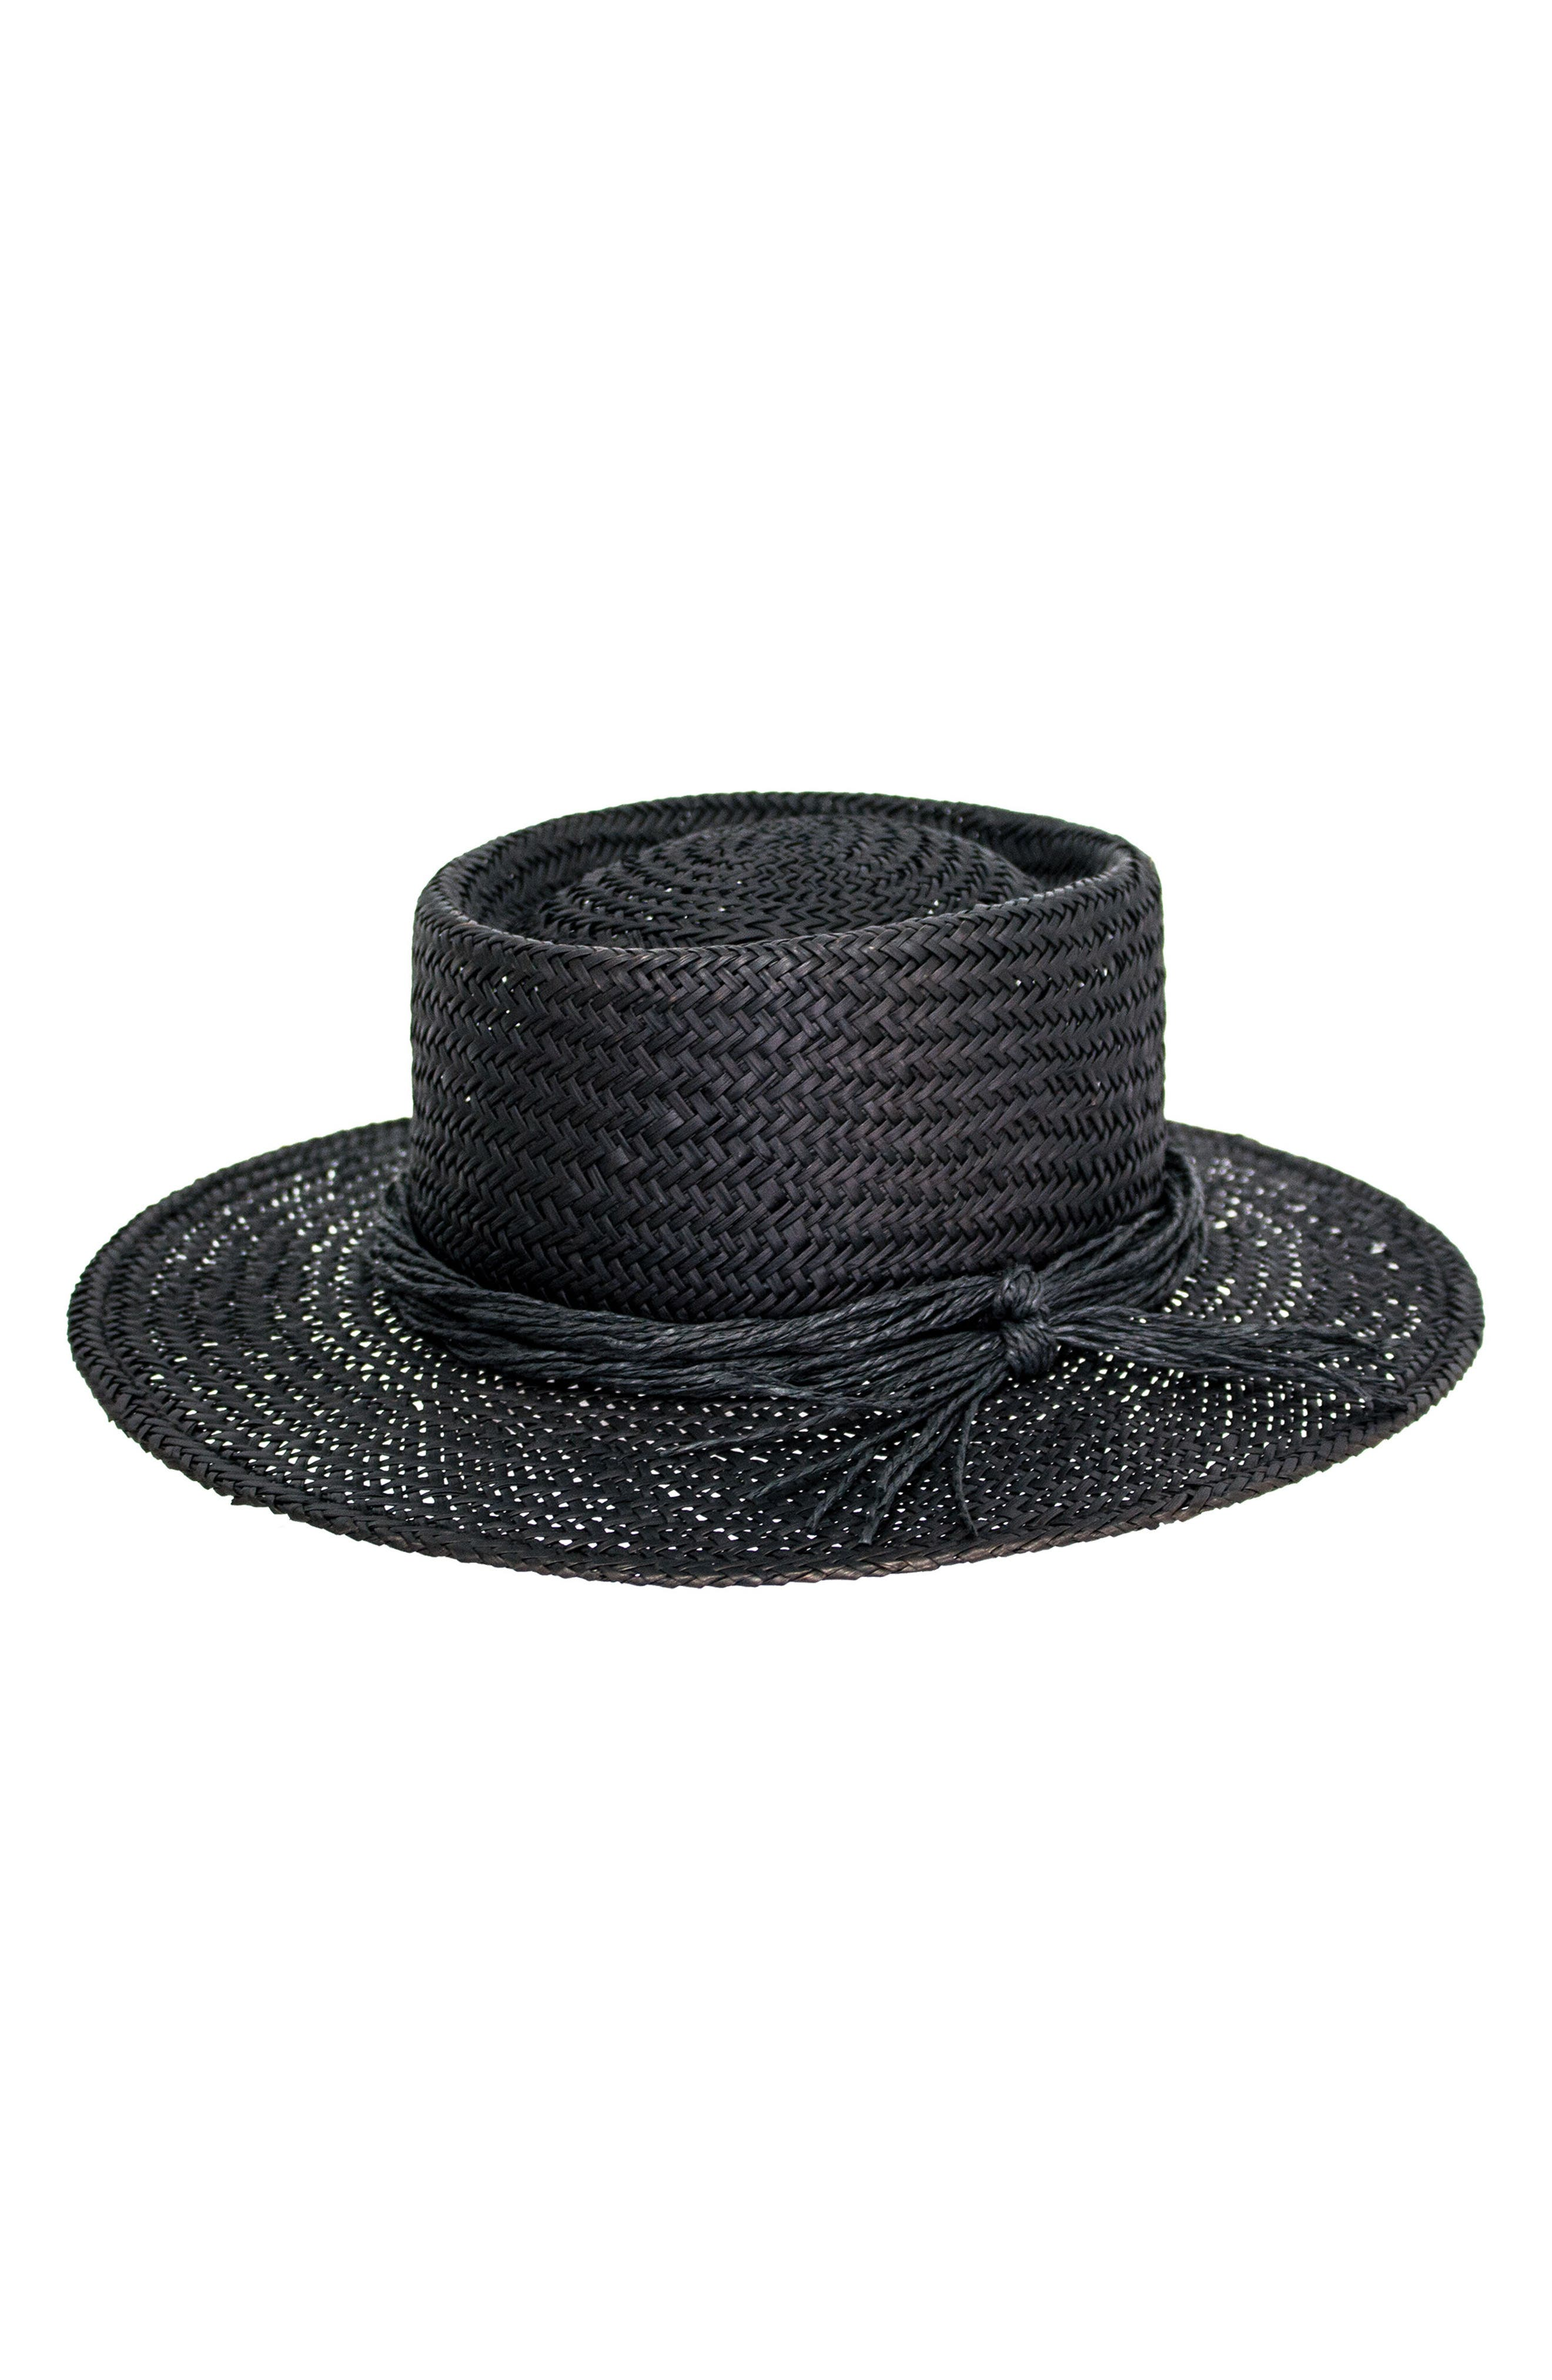 Borden Straw Resort Hat,                             Main thumbnail 1, color,                             001